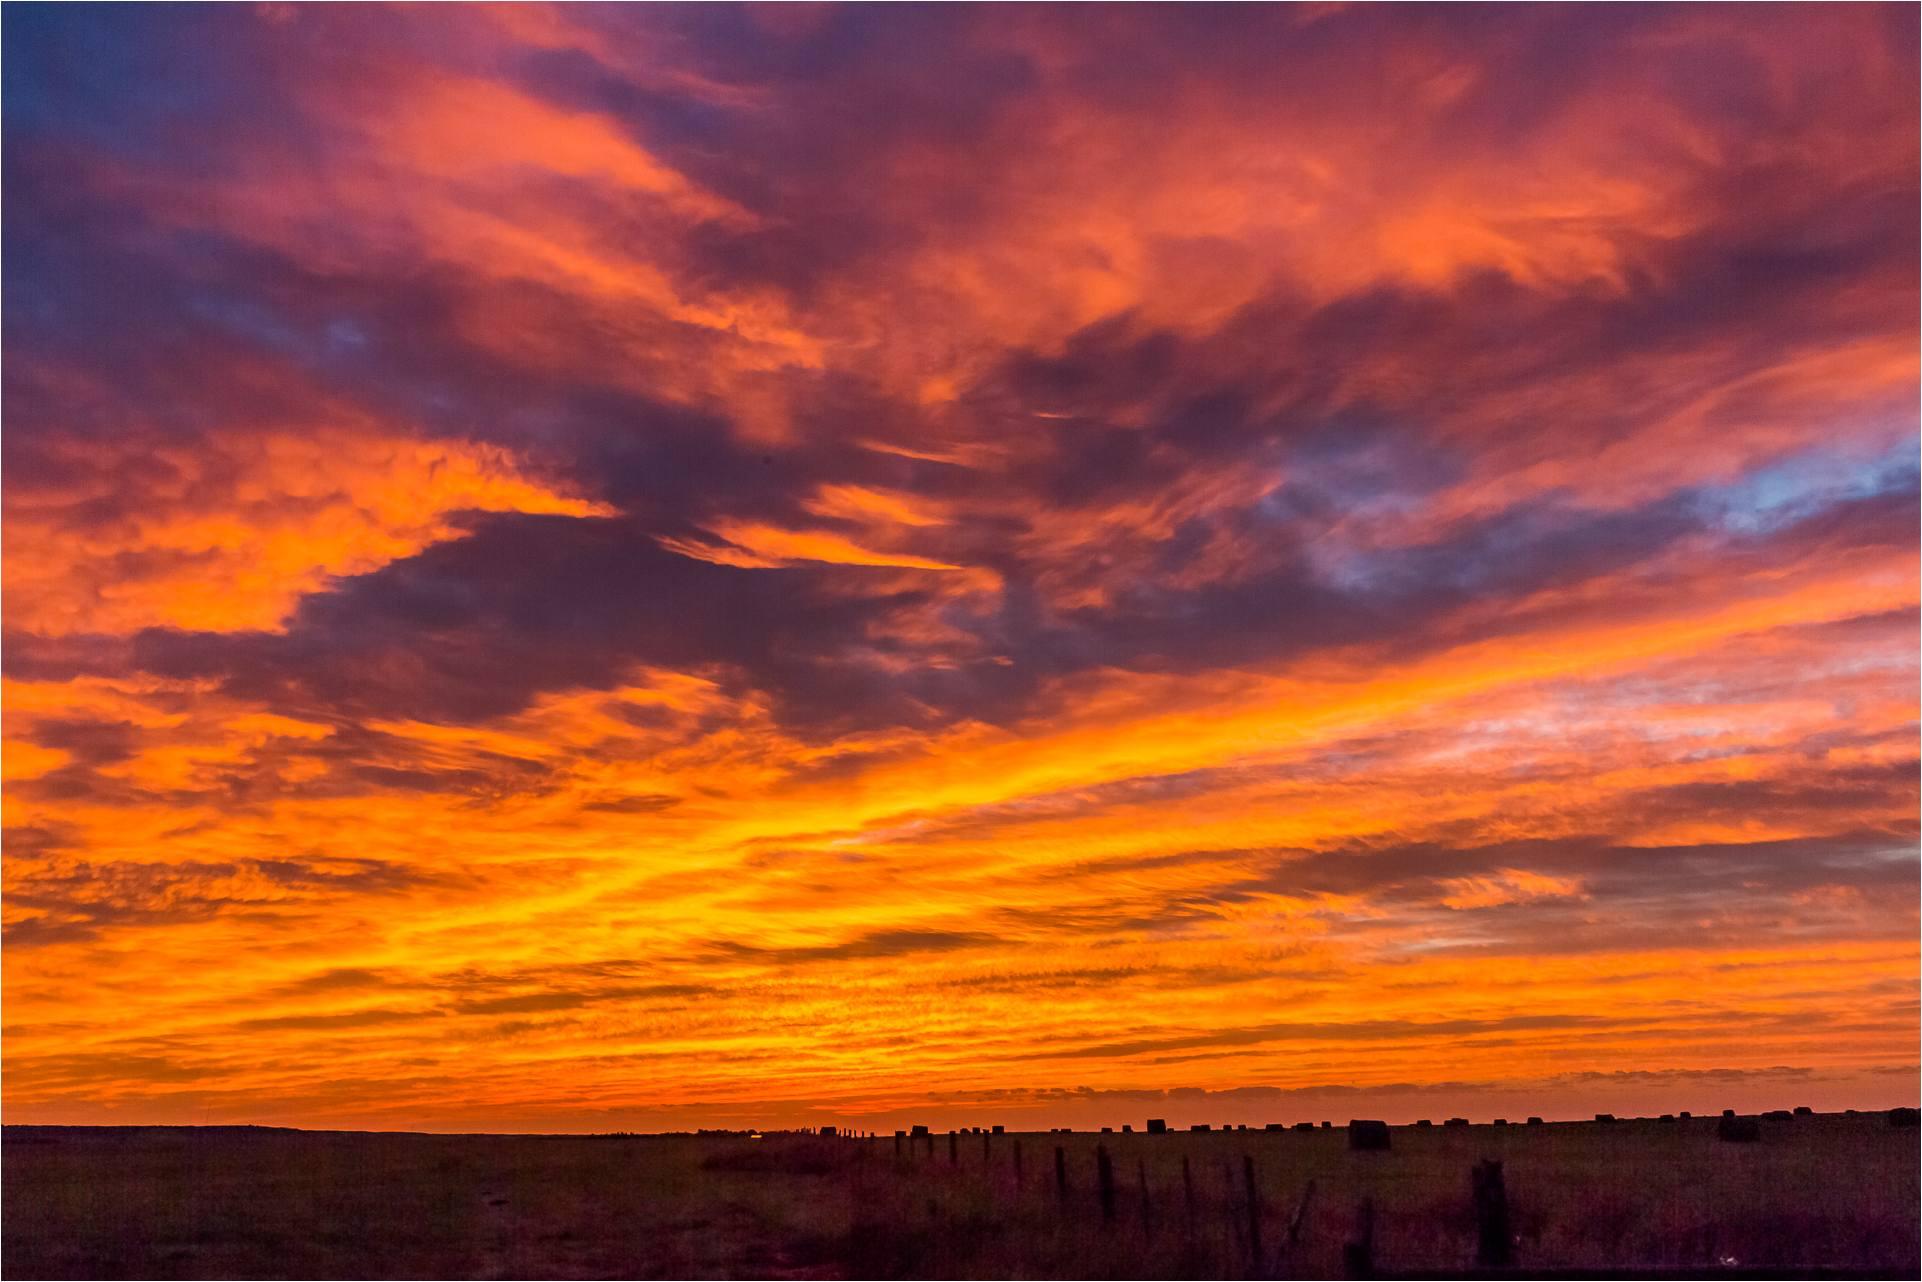 Autumn sunrise on the prairie | Christopher Martin Photography